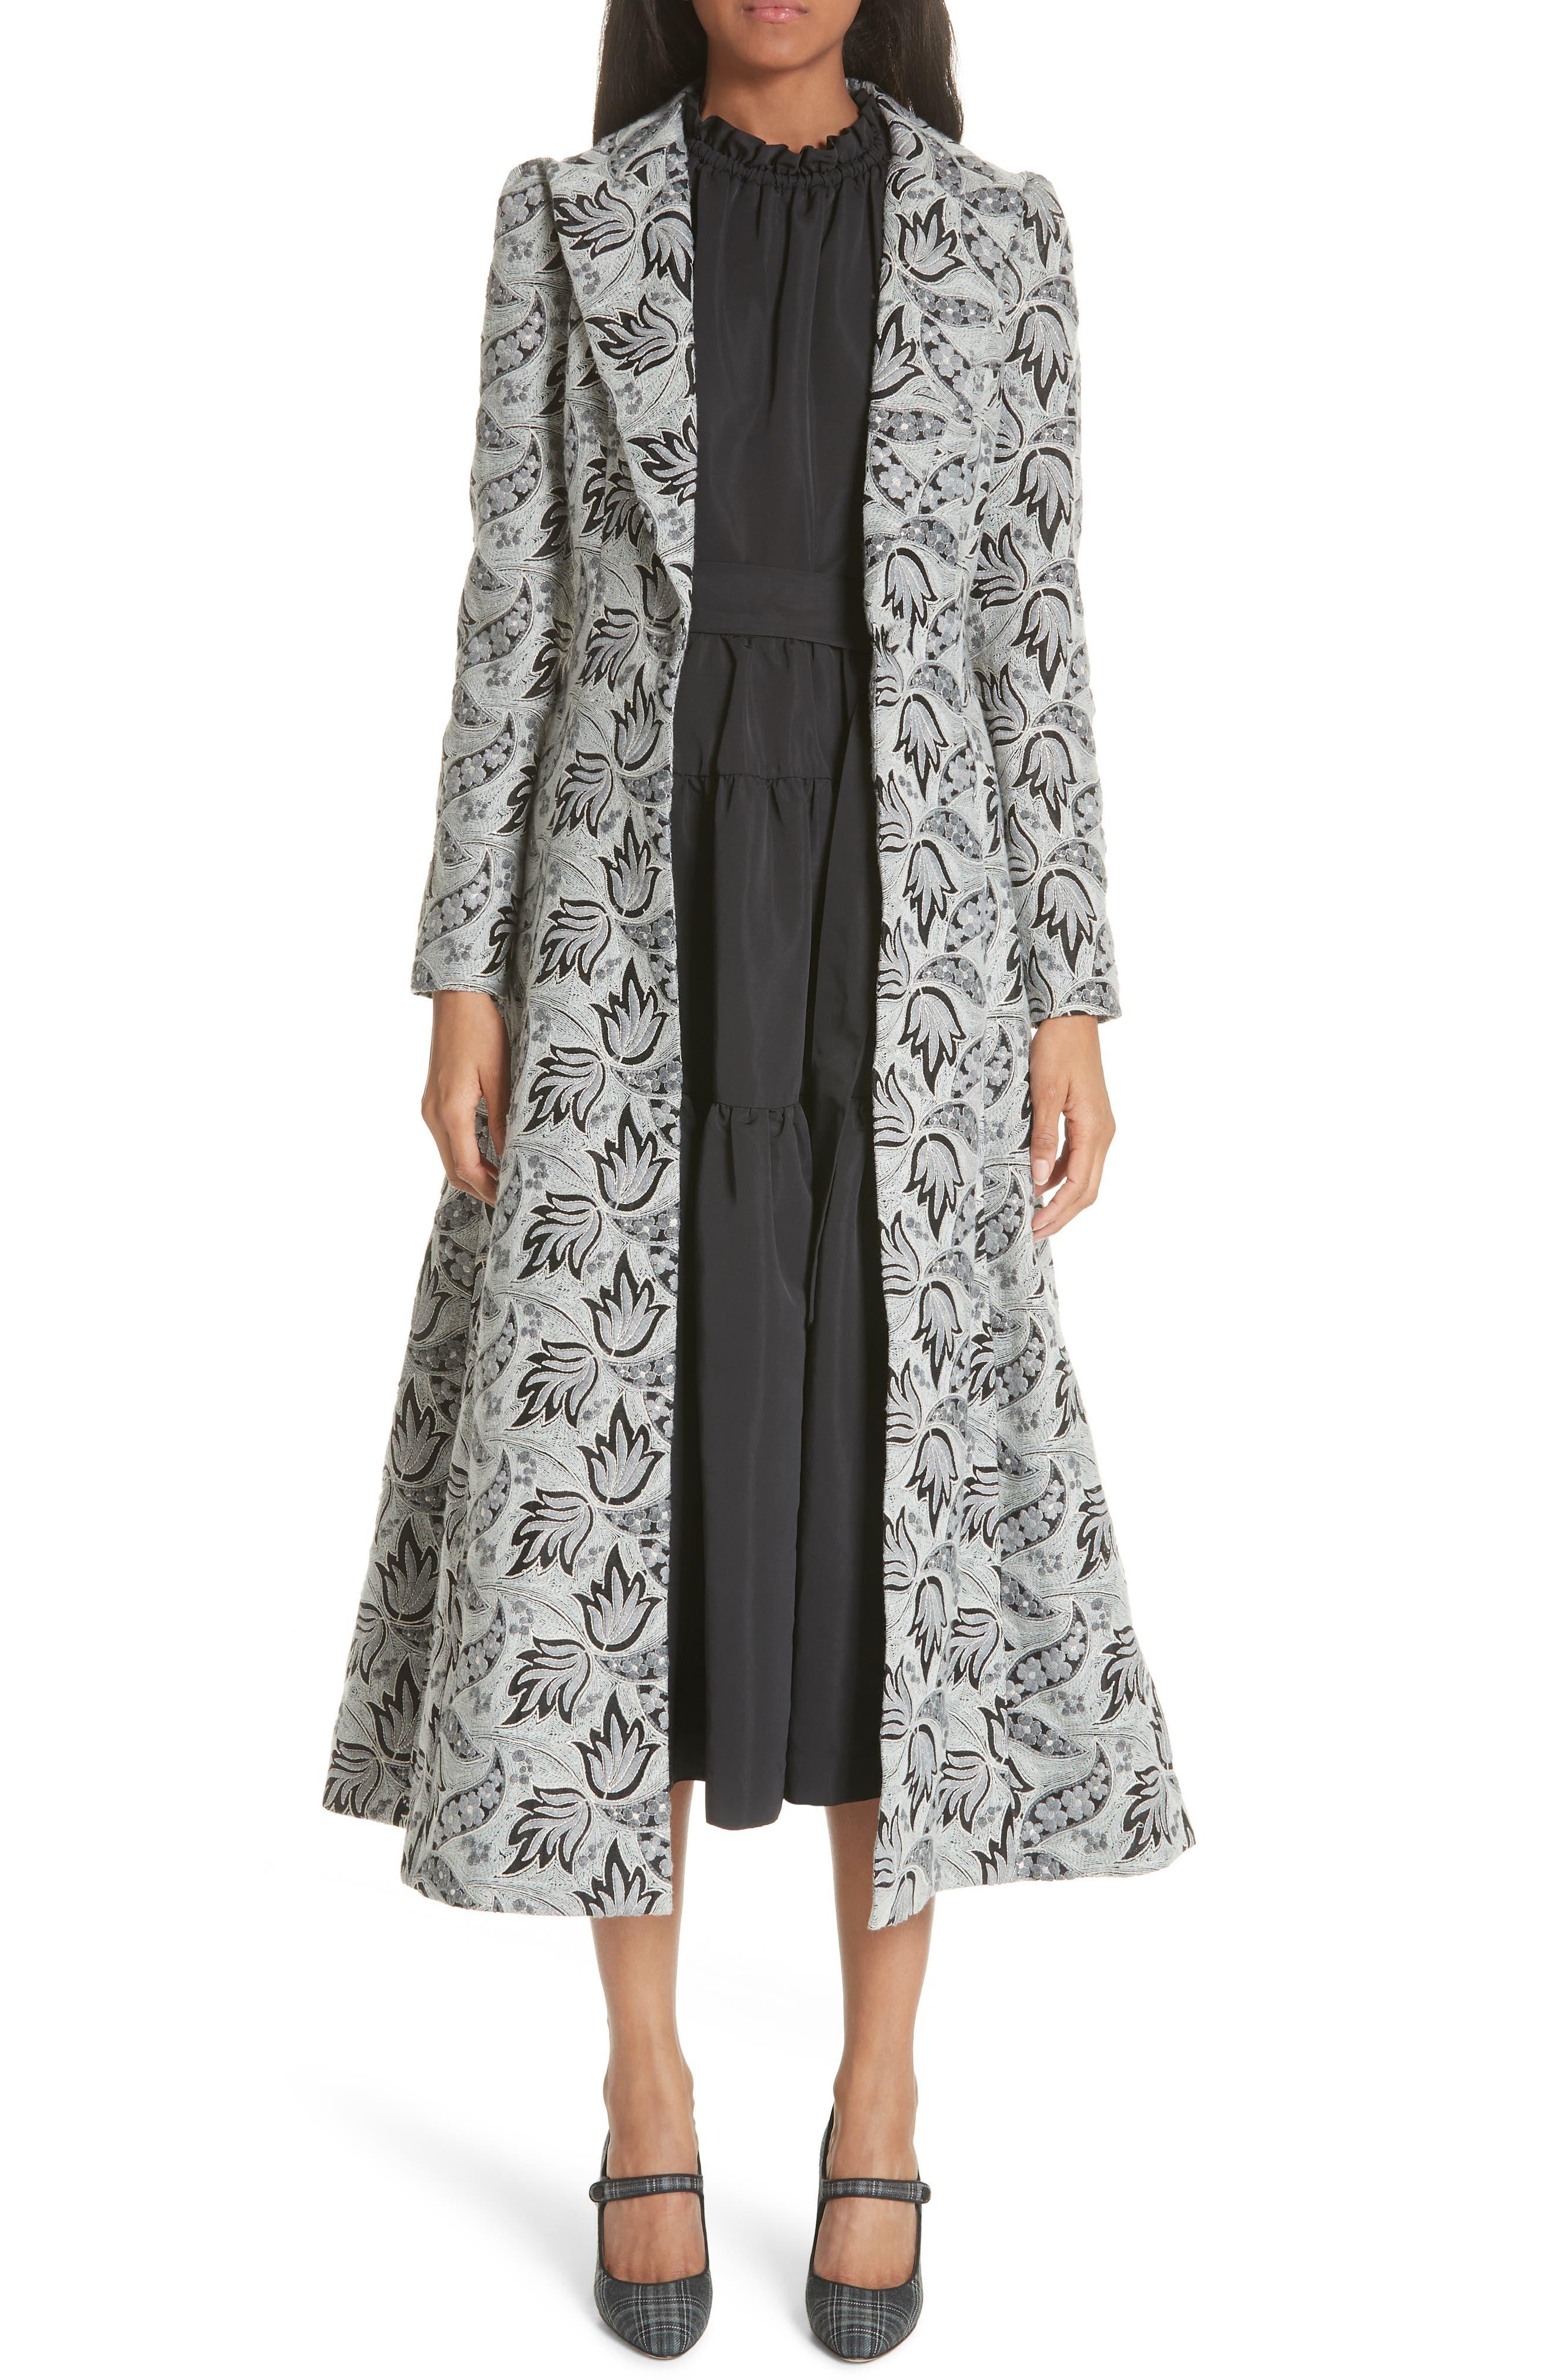 Vintage Coats & Jackets | Retro Coats and Jackets Womens Co Long Embroidered Jacquard Coat Size Medium - Grey $1,796.98 AT vintagedancer.com